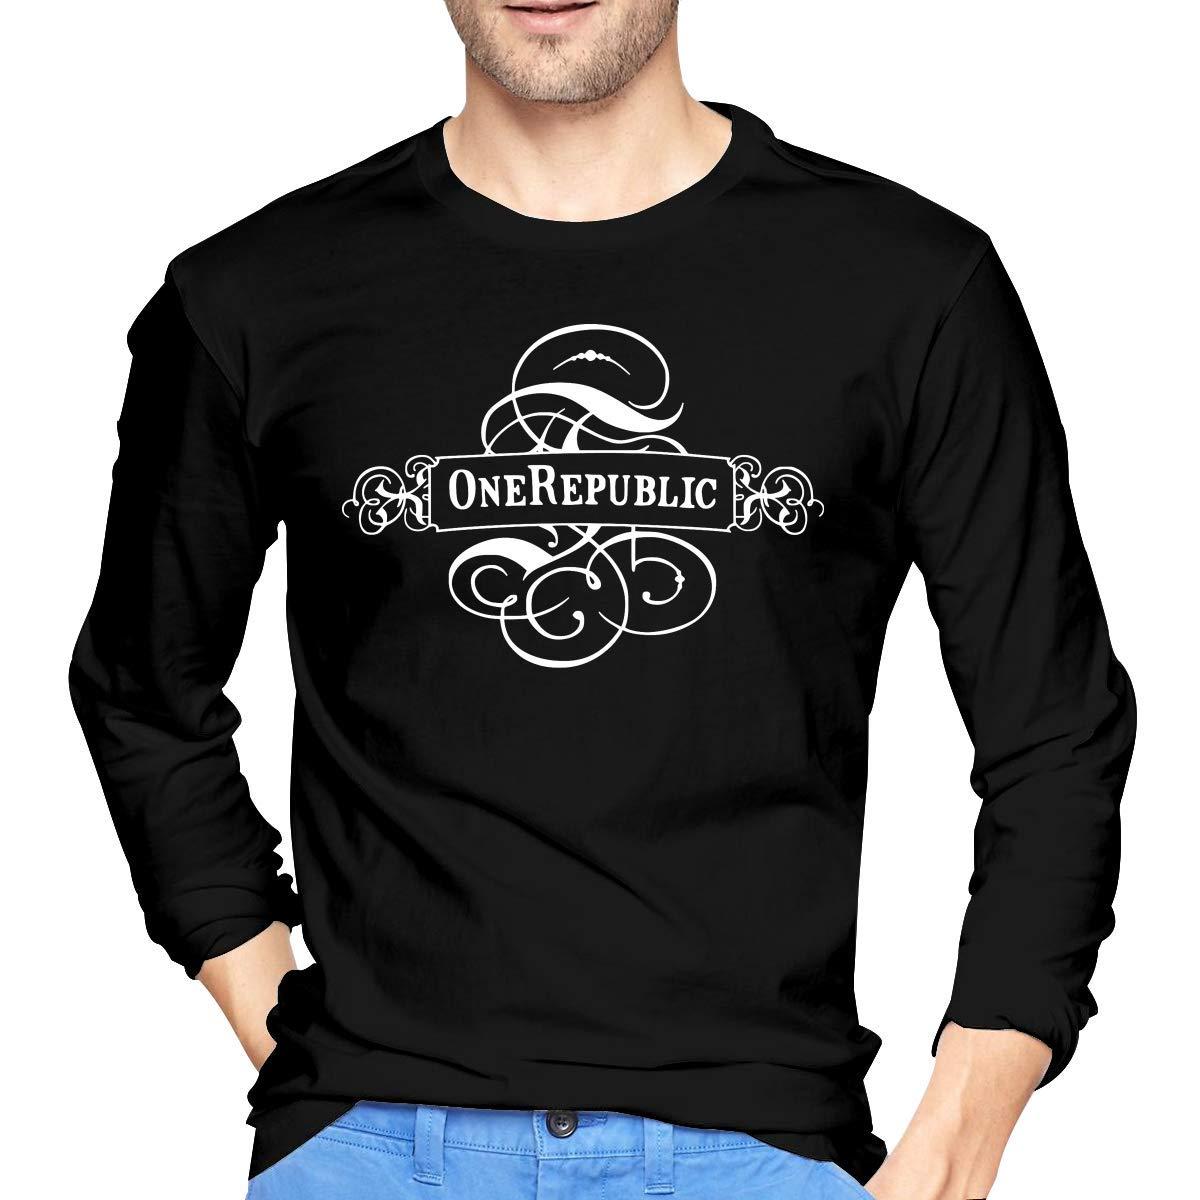 Fssatung S One Republic T Shirt Black